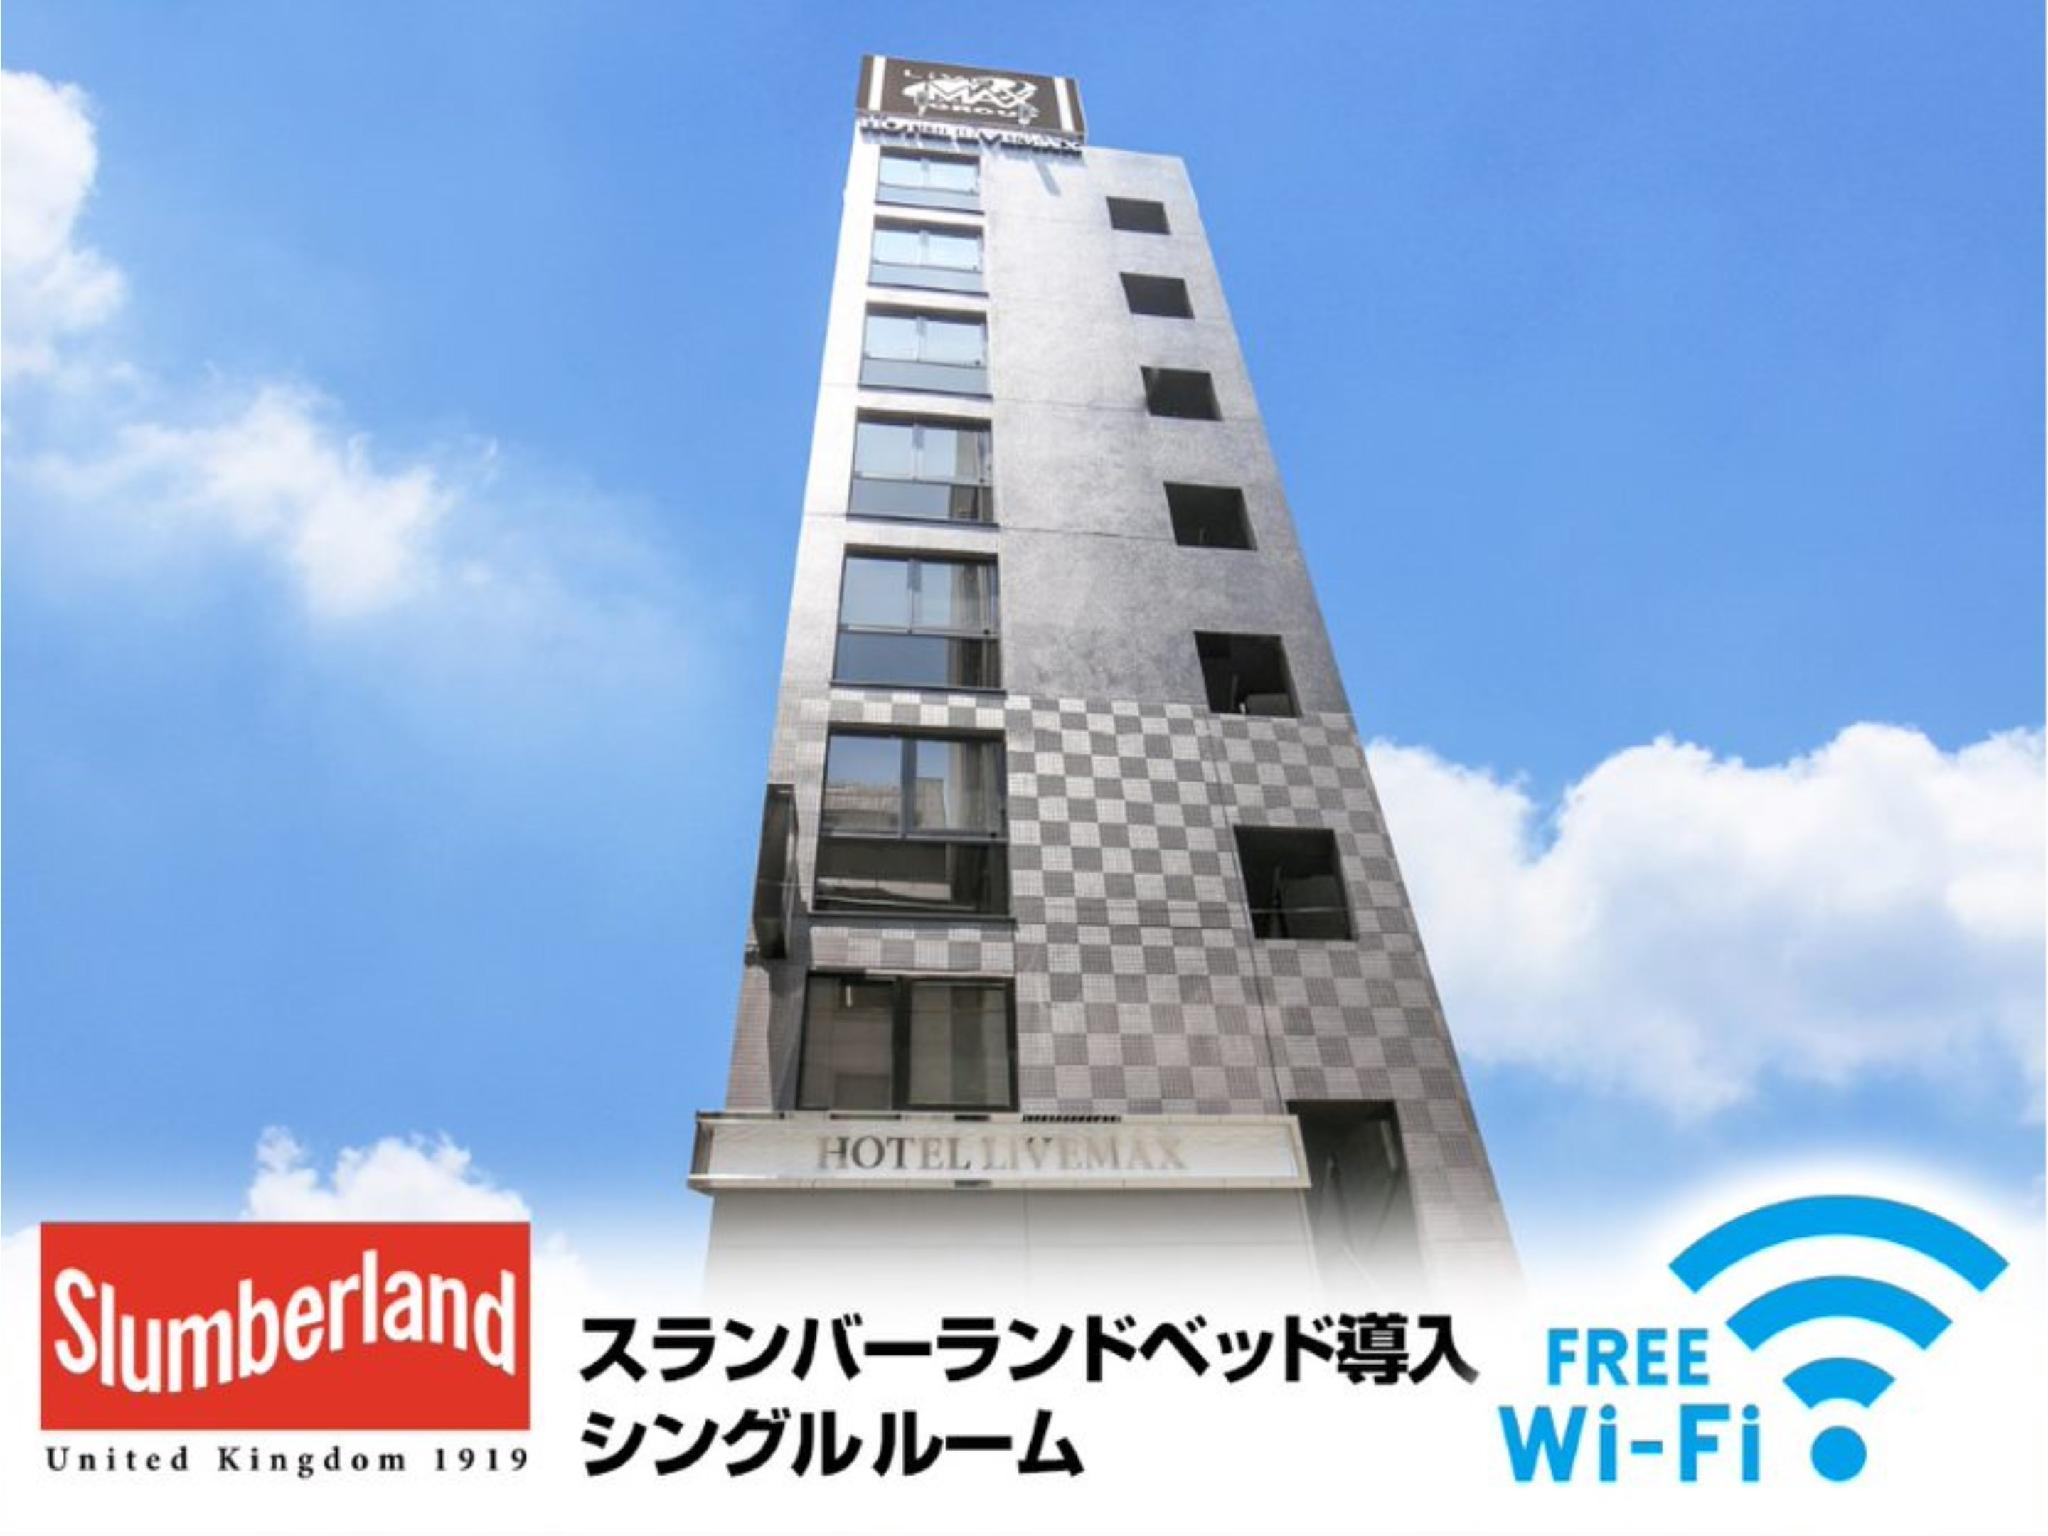 Hotel LiveMax Nihonbashi Ningyocho